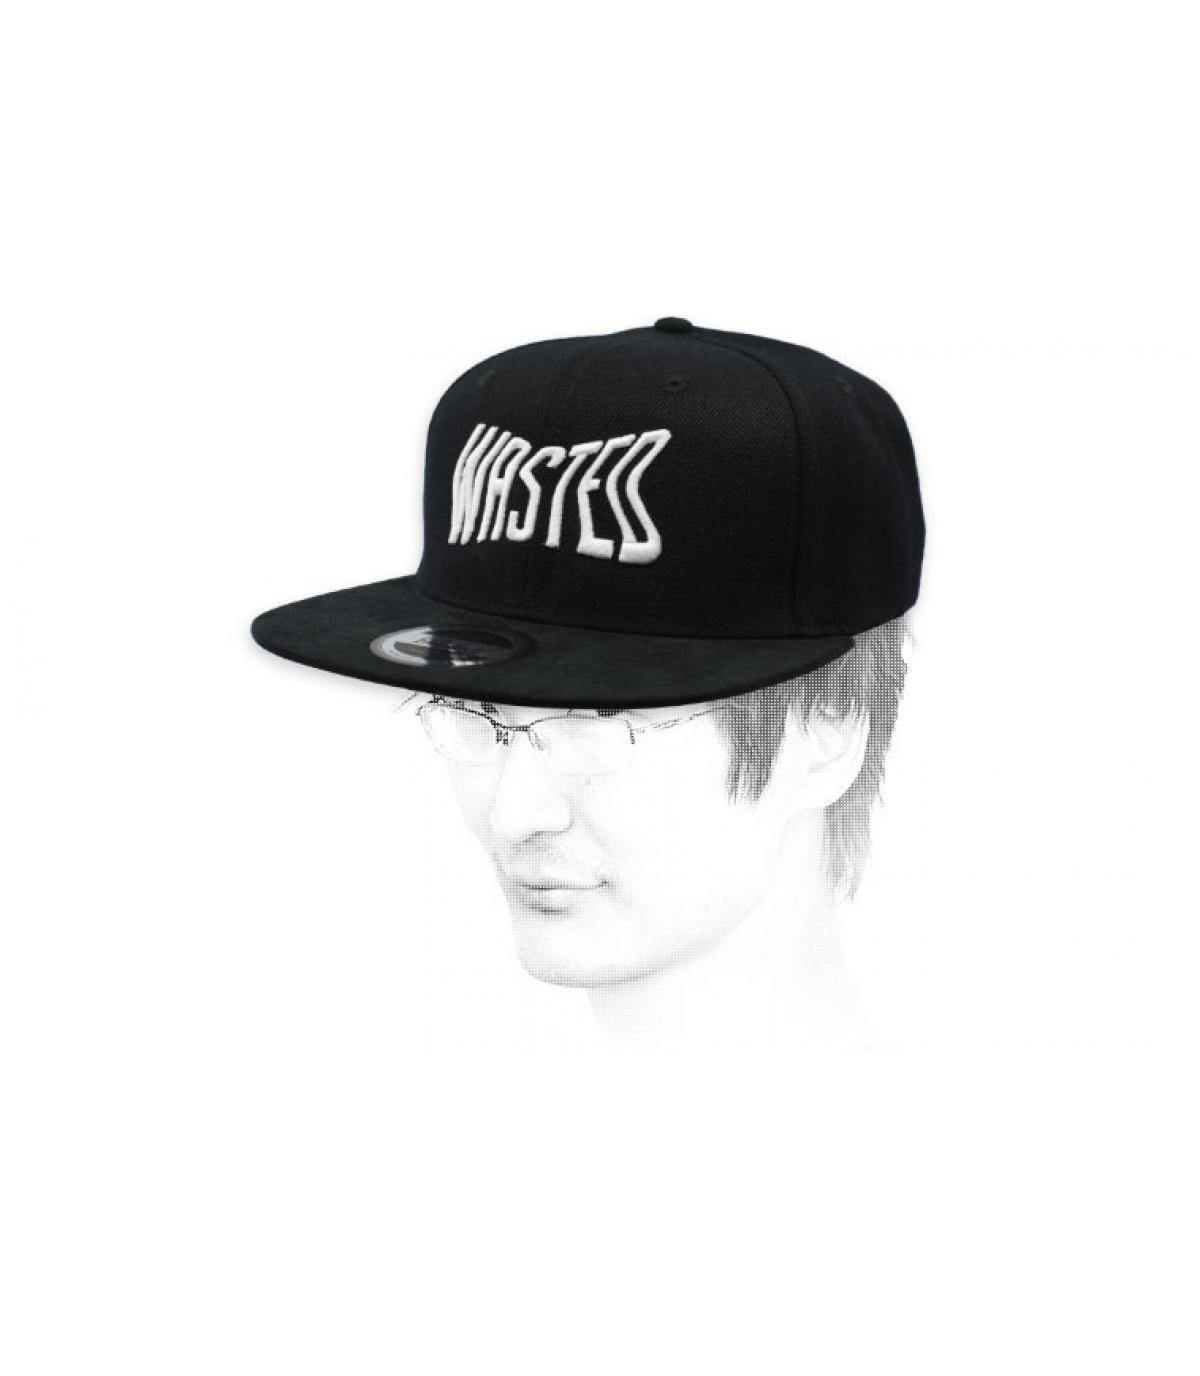 black wasted snapback